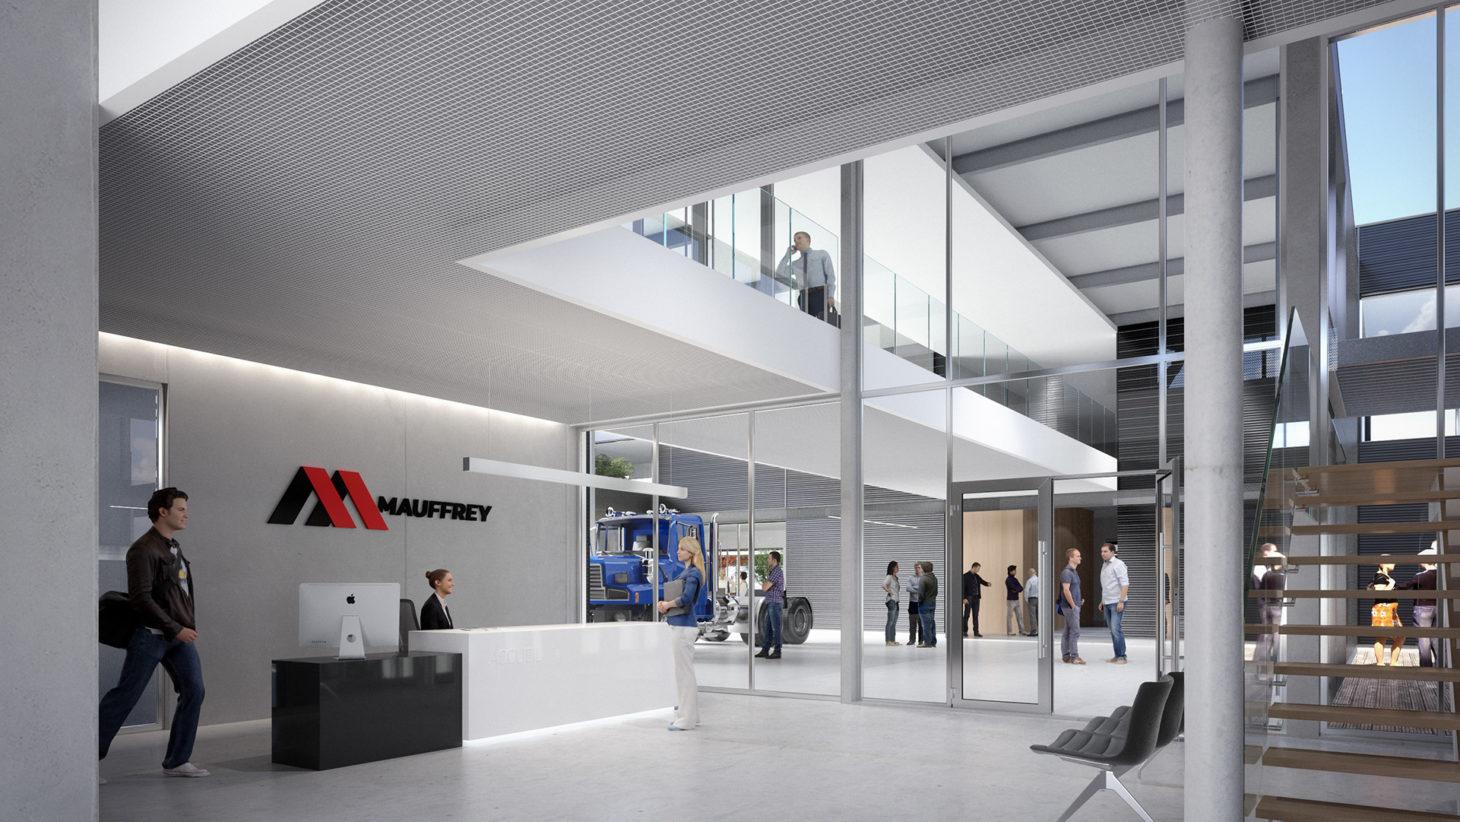 Academy-Mauffrey-bureau-interieur2